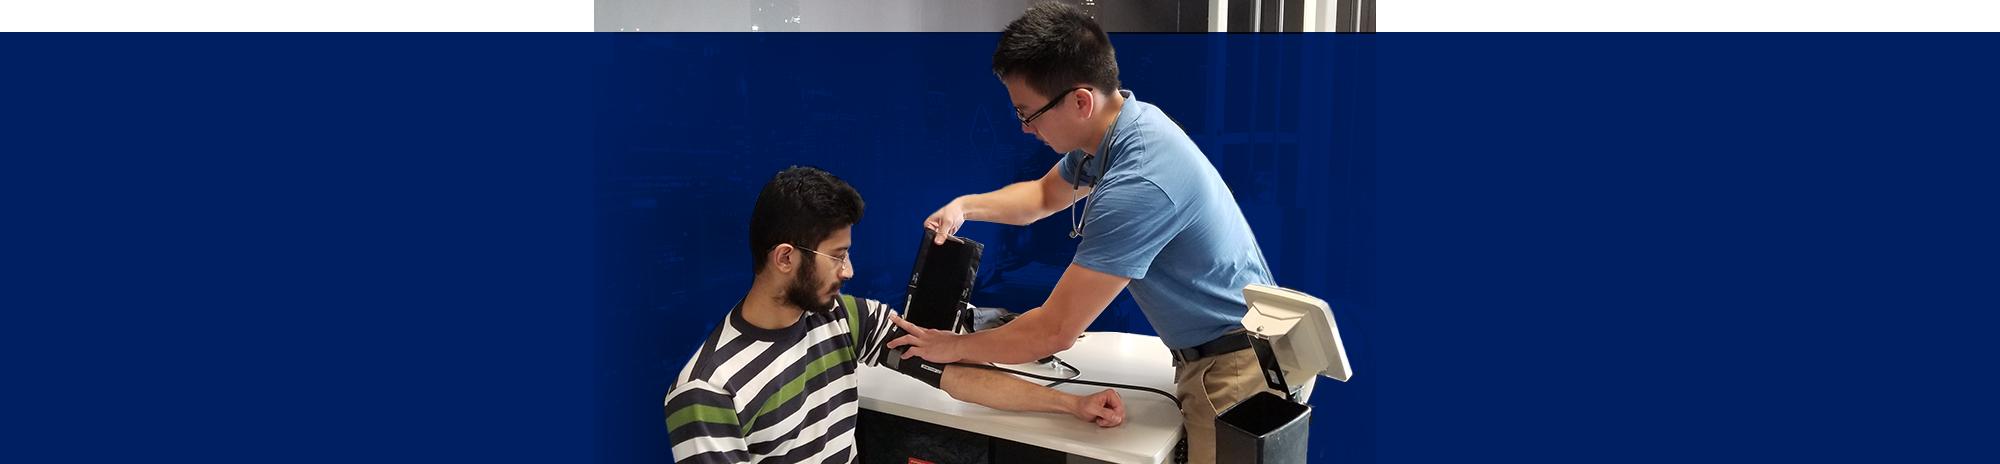 Researchers take blood pressure